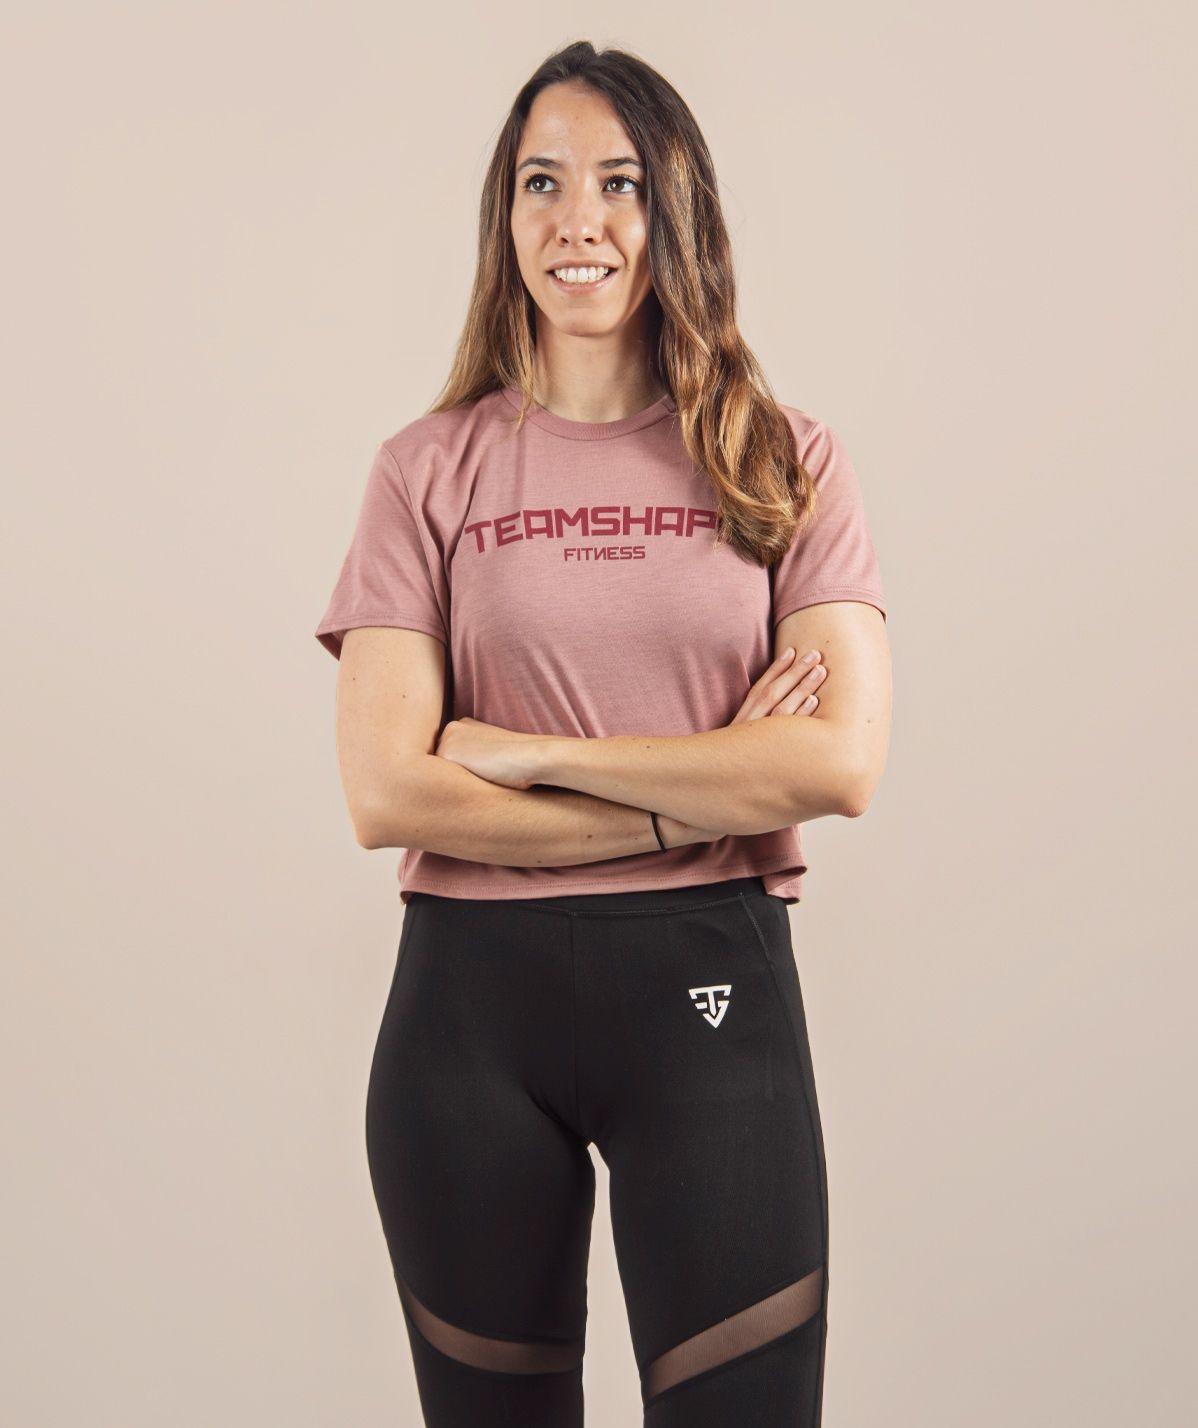 Croptop Femme bordeaux Fitness